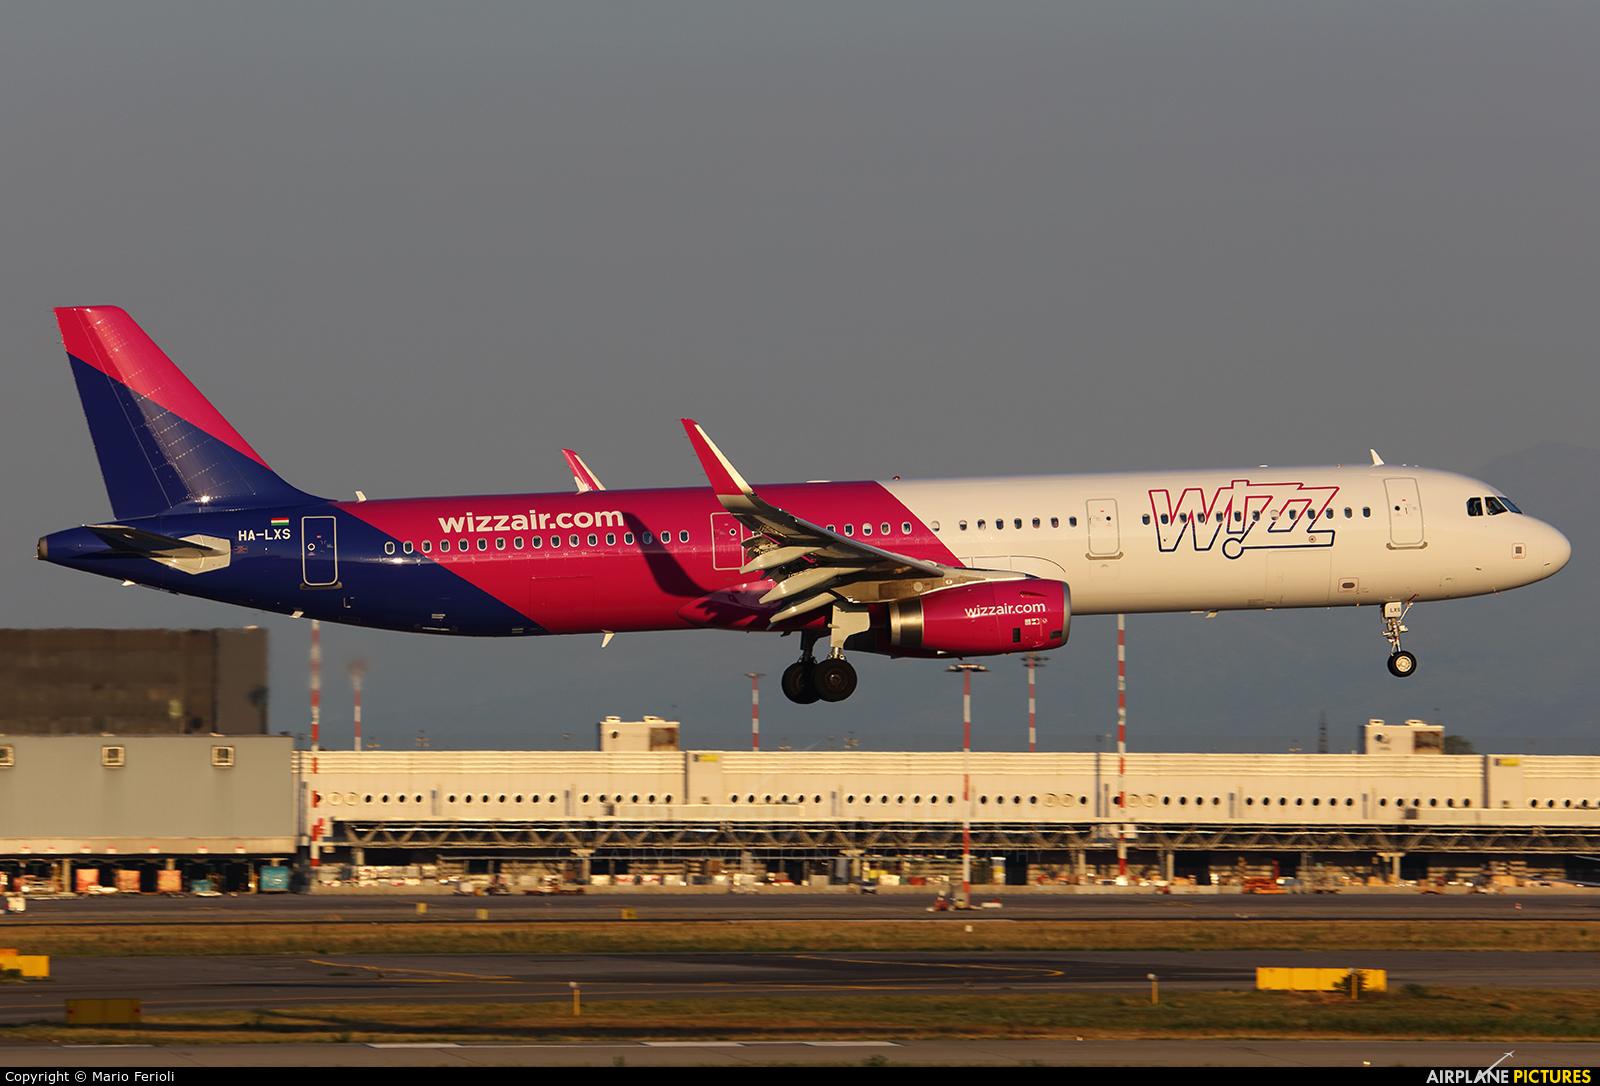 Wizz Air HA-LXS aircraft at Milan - Malpensa